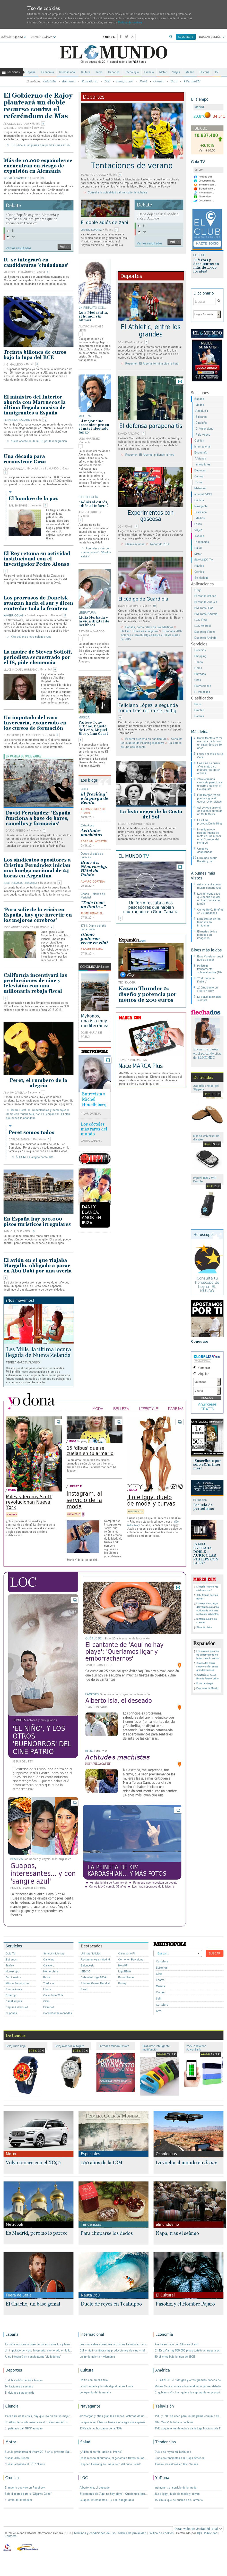 El Mundo at Thursday Aug. 28, 2014, 6:12 a.m. UTC